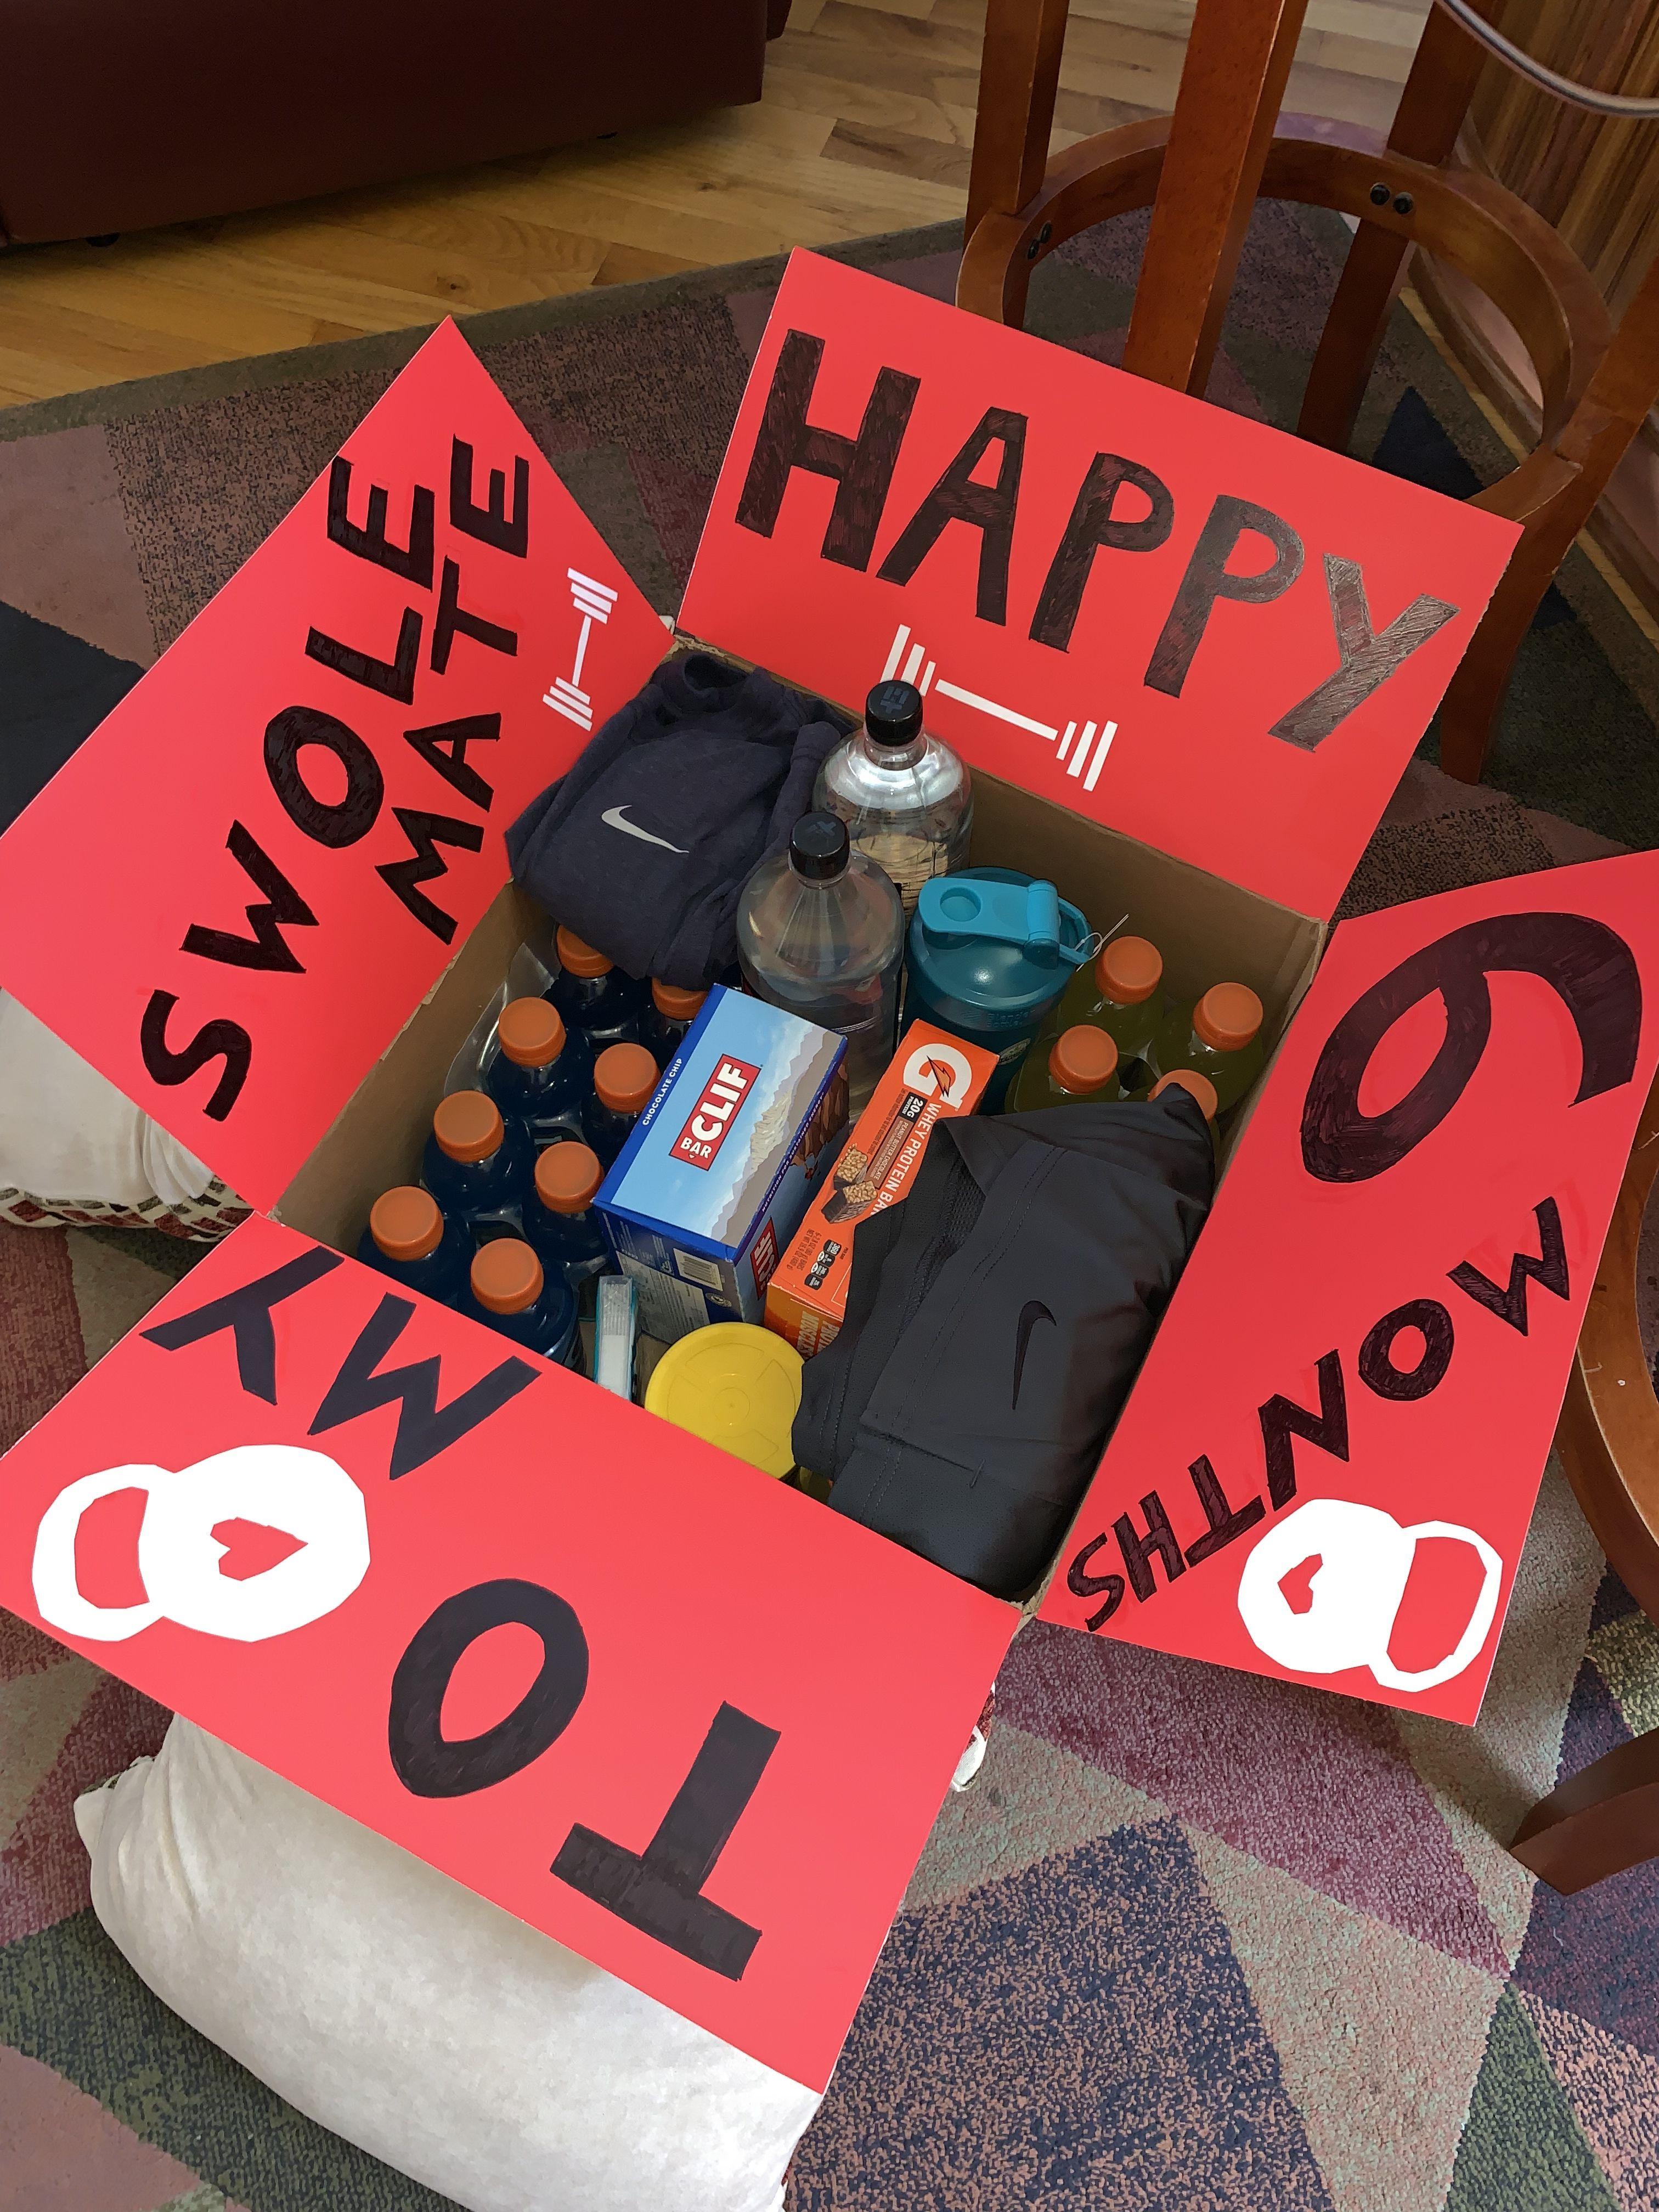 6 month anniversary present idea for boyfriend who loves